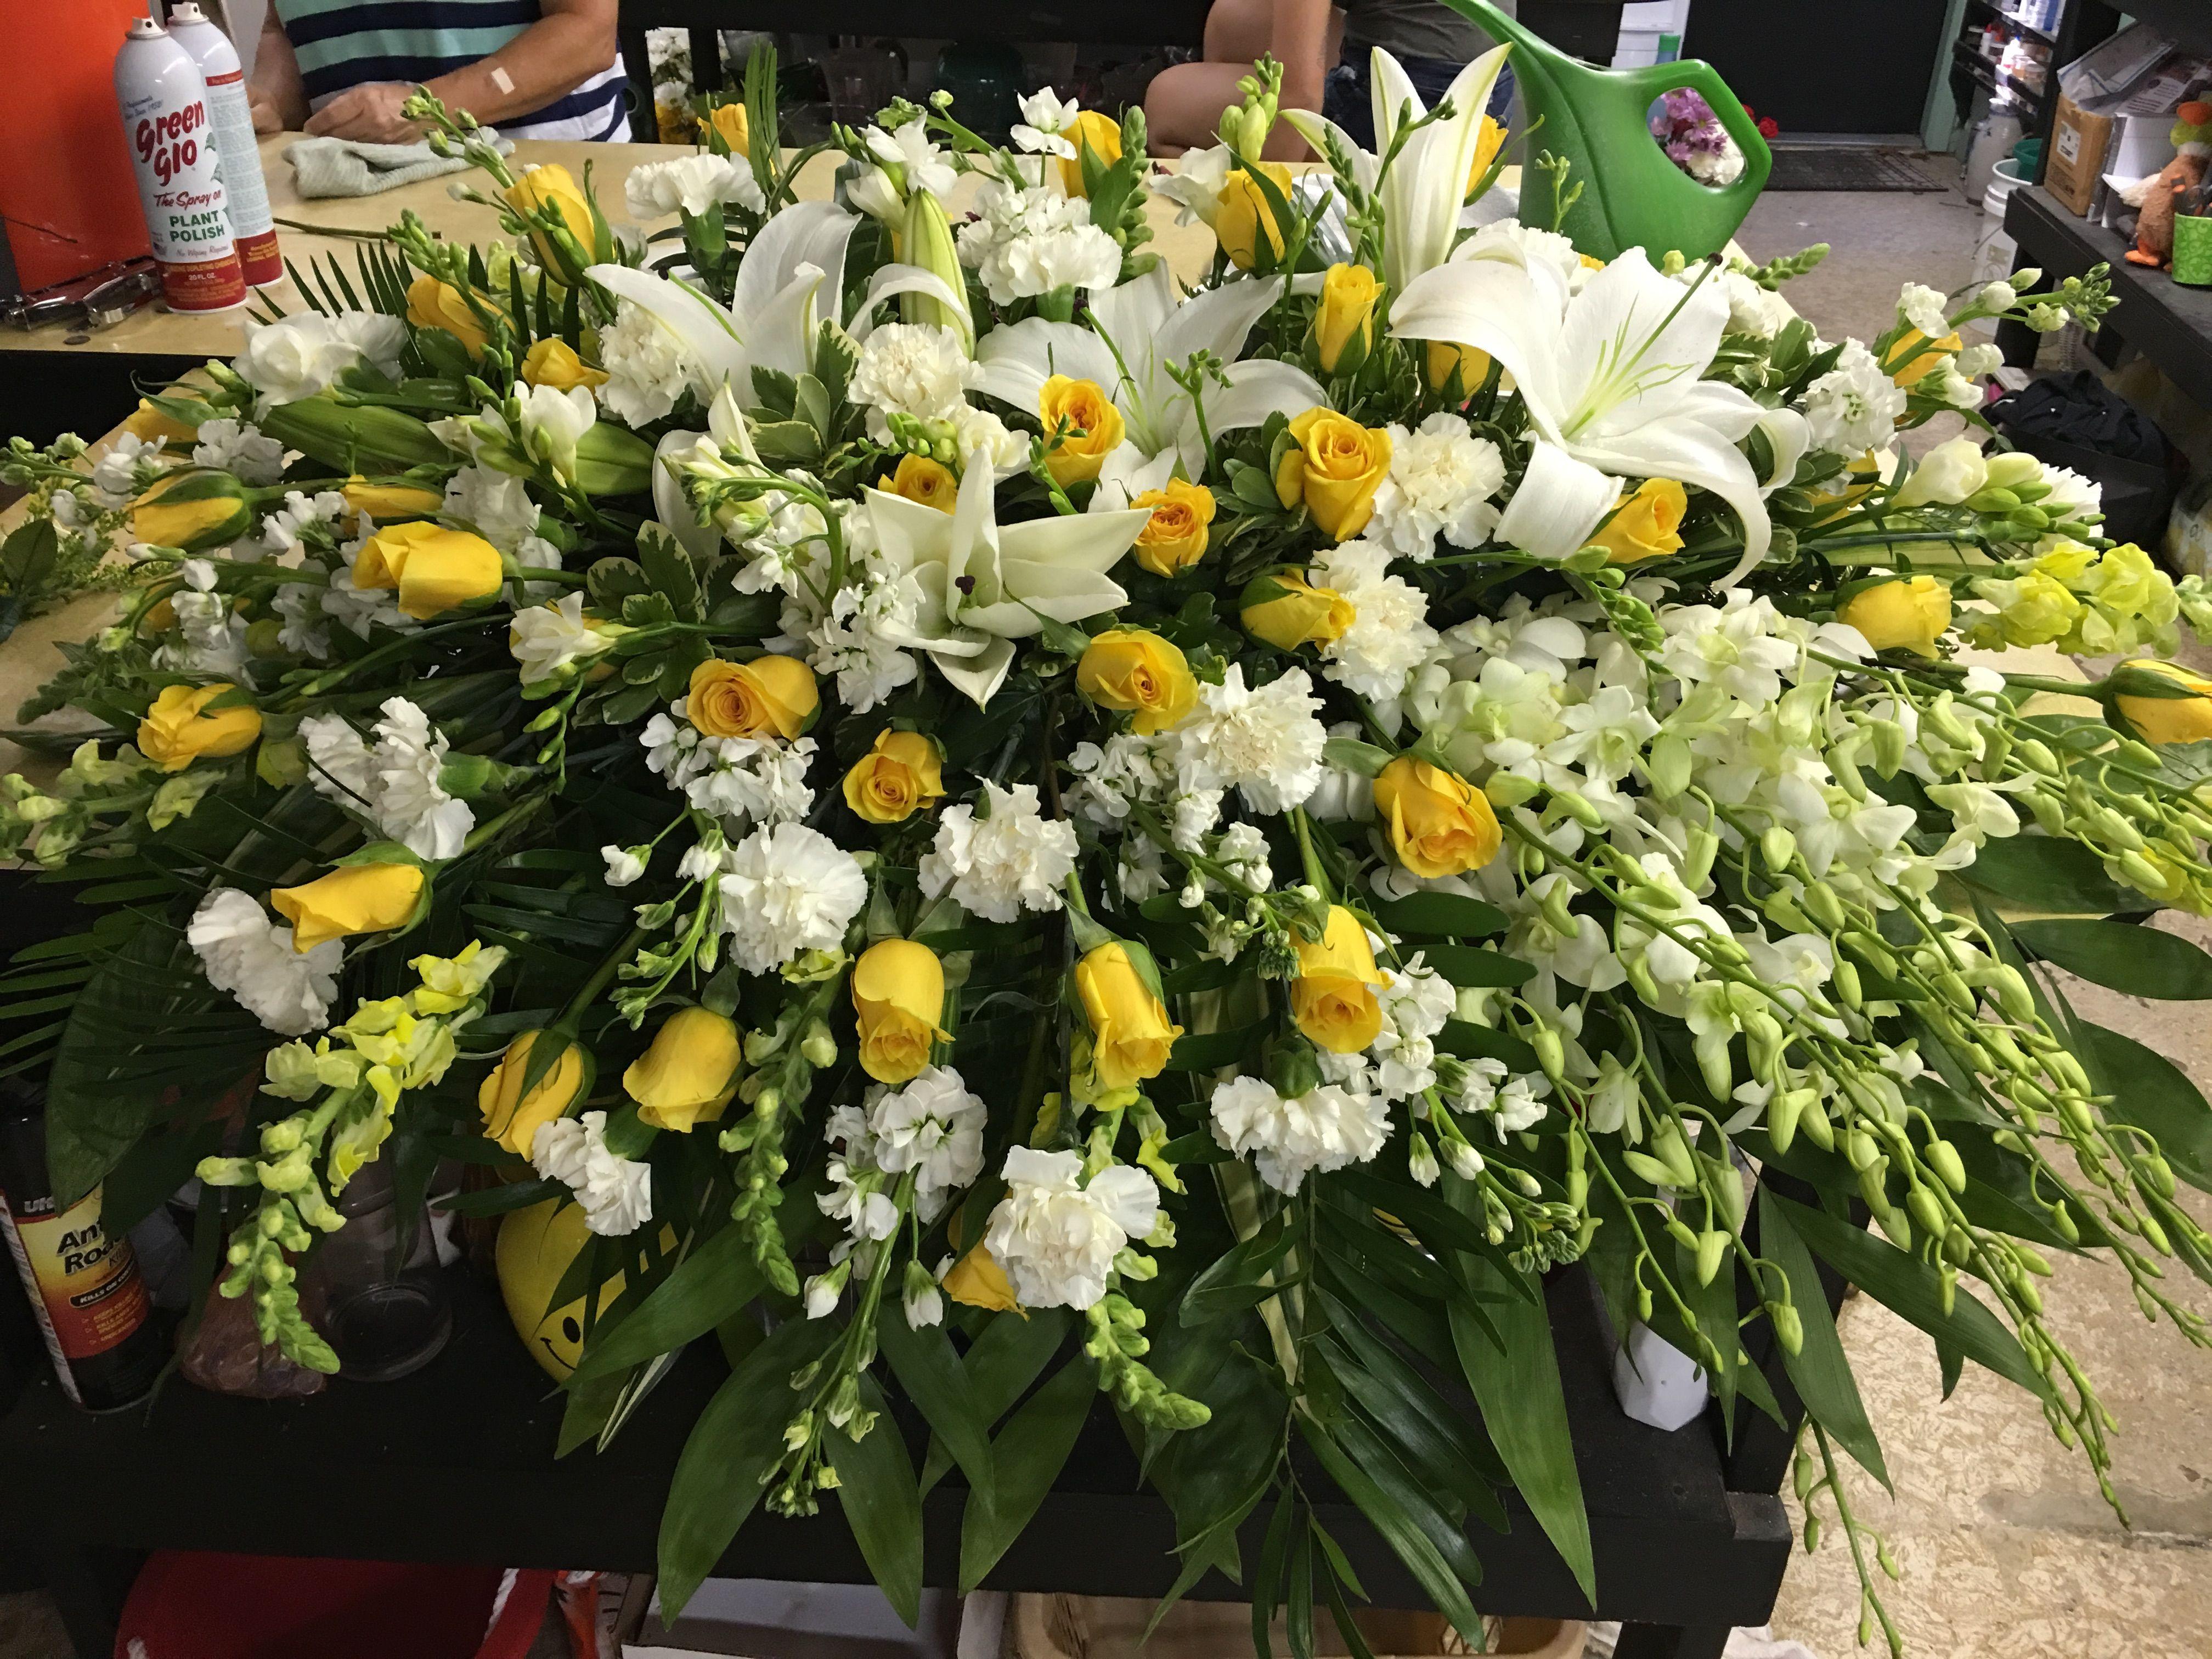 Pin By Dotties Florist On Funeral Flowers Pinterest Funeral Flowers